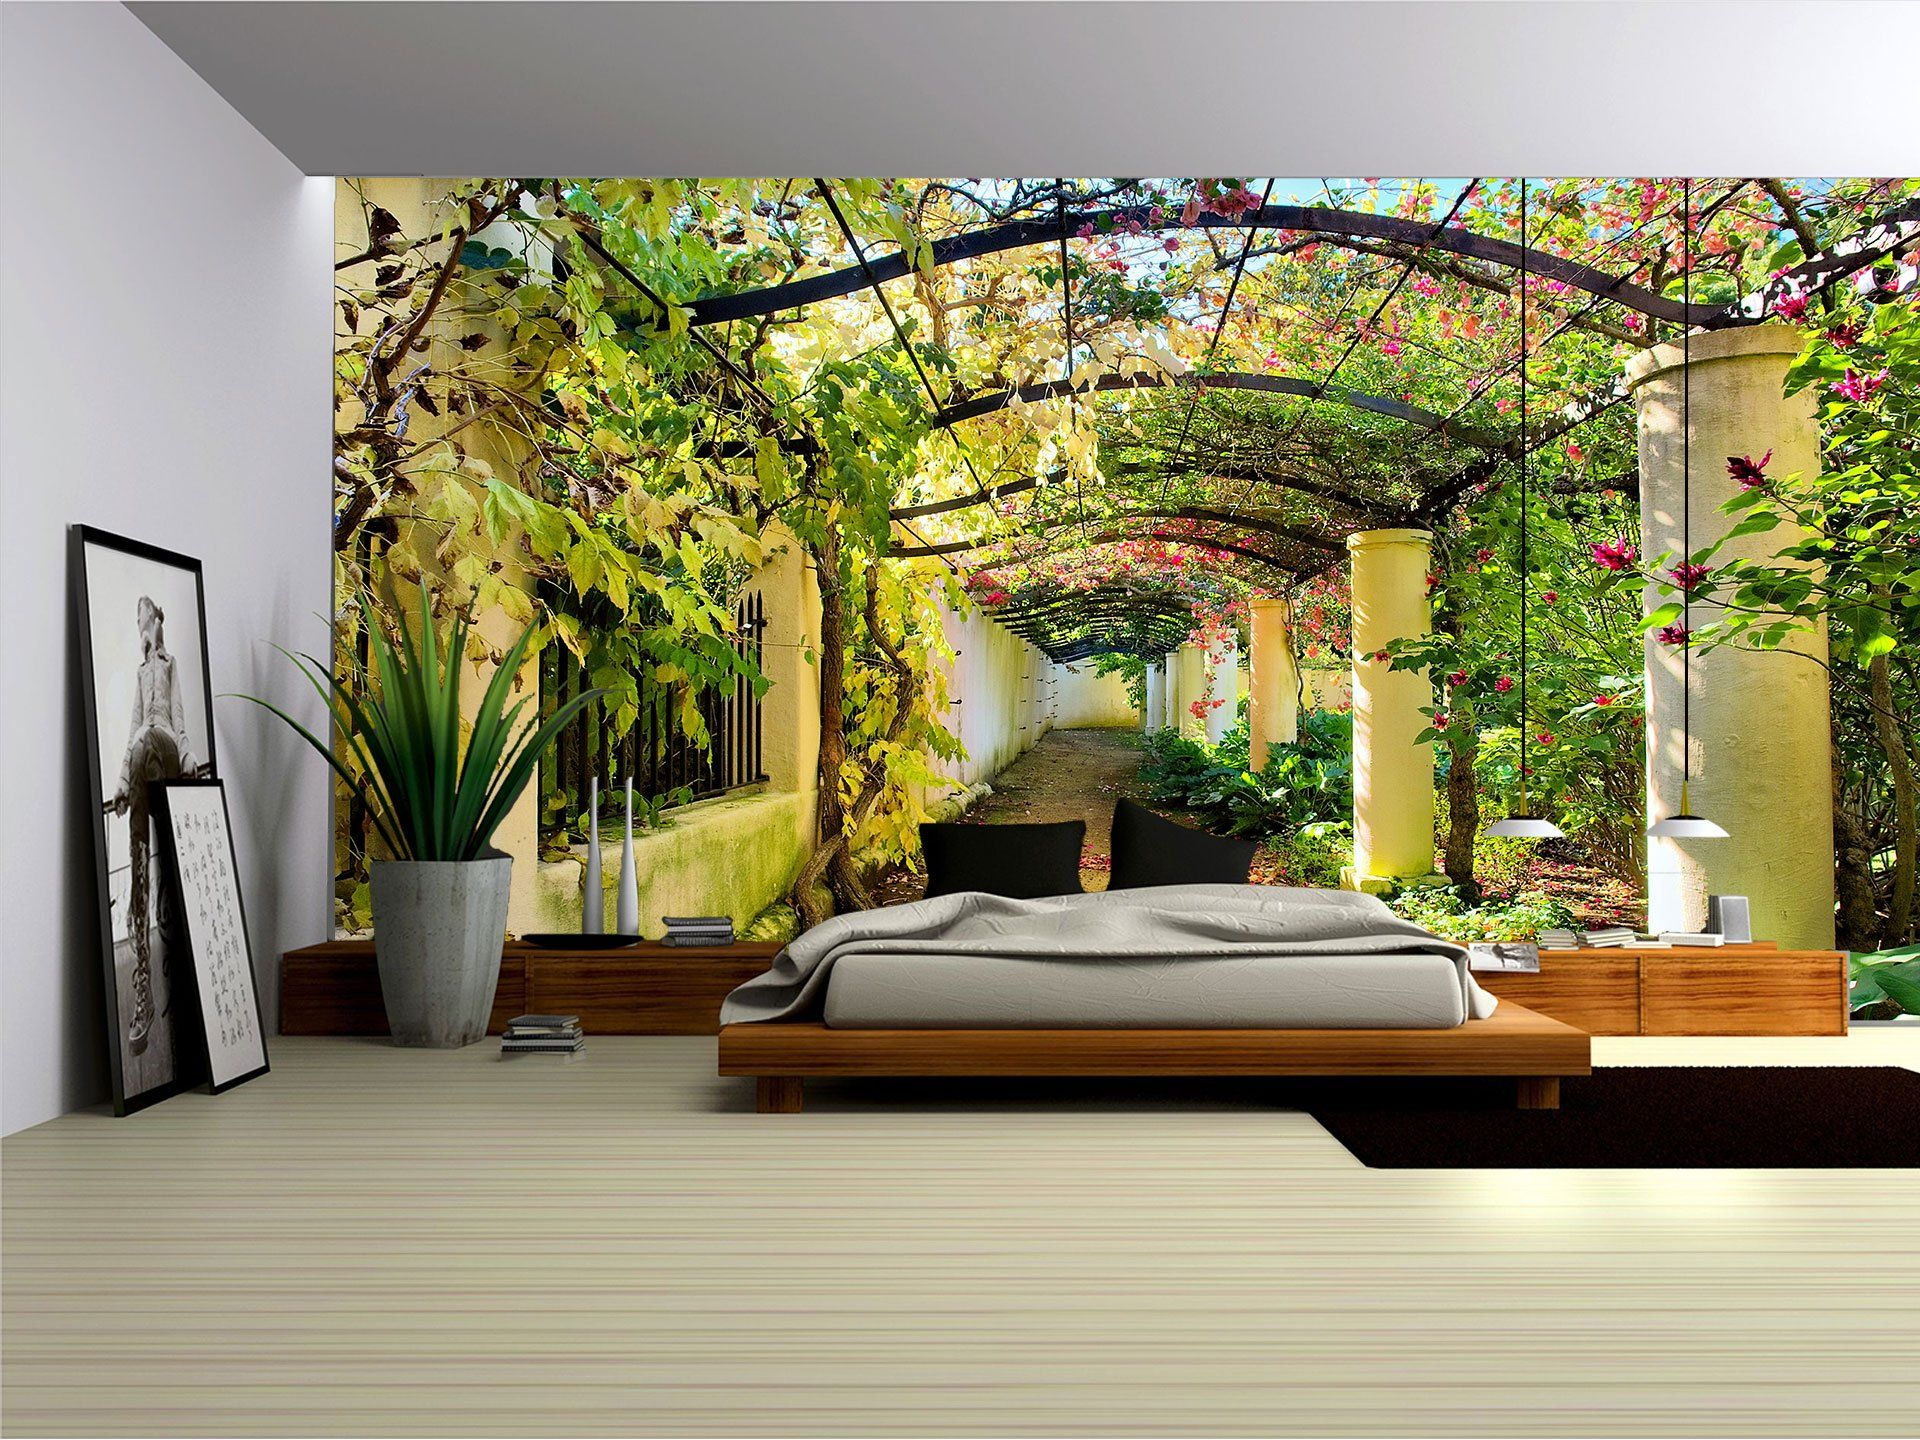 vlies fototapete tapete bild s m l xl xxl 3xl pflanzentunnel blumengasse 136ve wohnideen. Black Bedroom Furniture Sets. Home Design Ideas